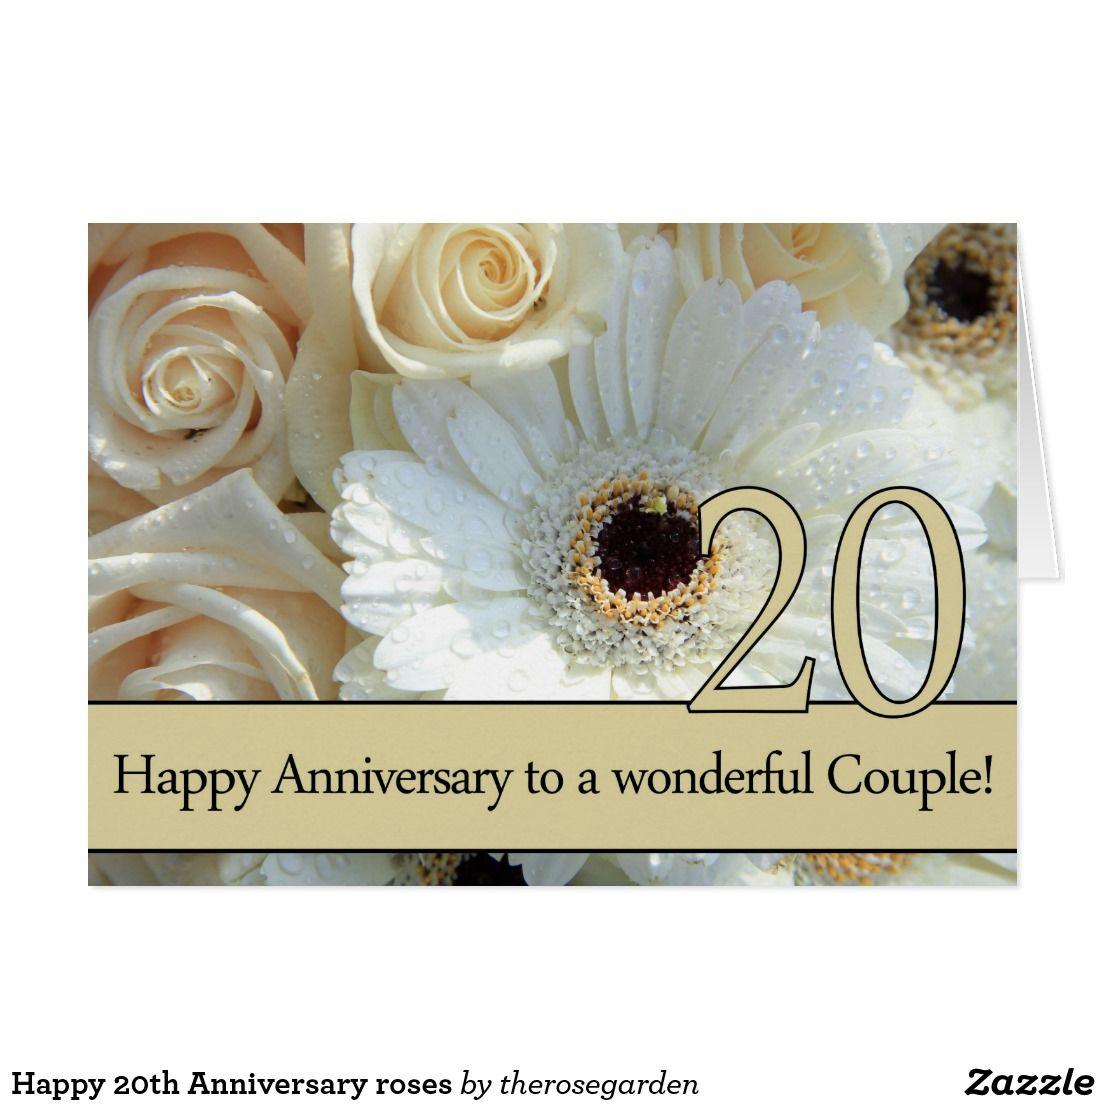 Happy 20th Anniversary roses Card Zazzle.co.uk Happy